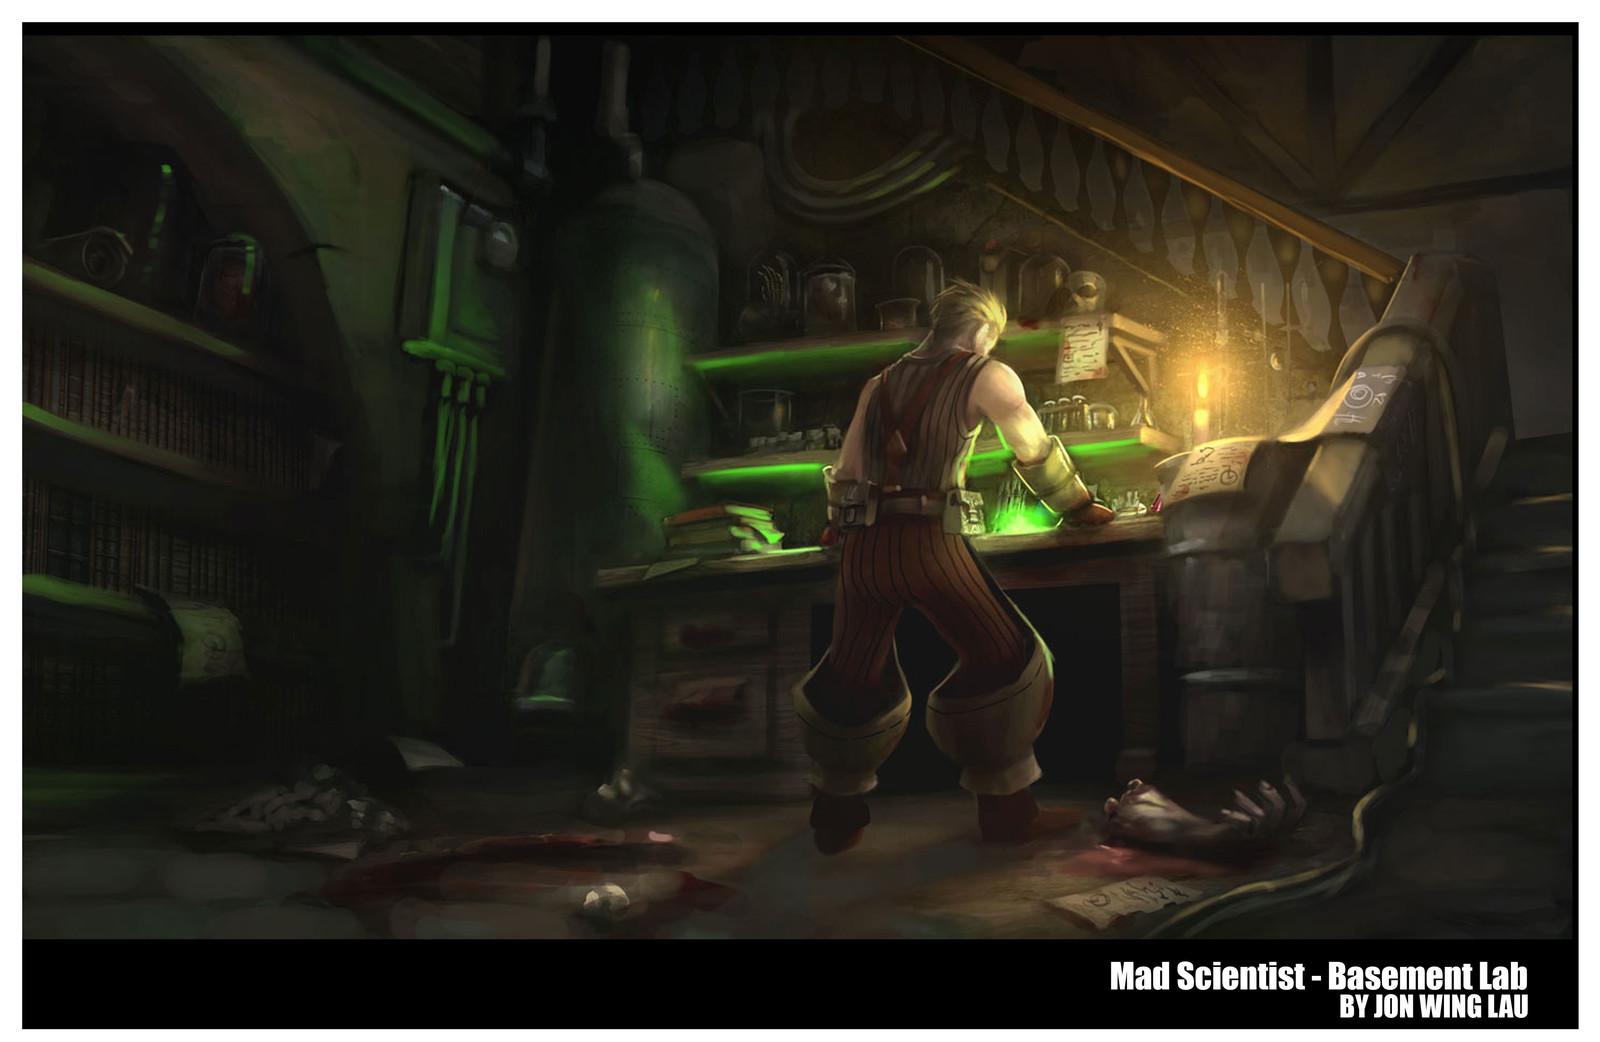 Mad Scientist - Basement Shot